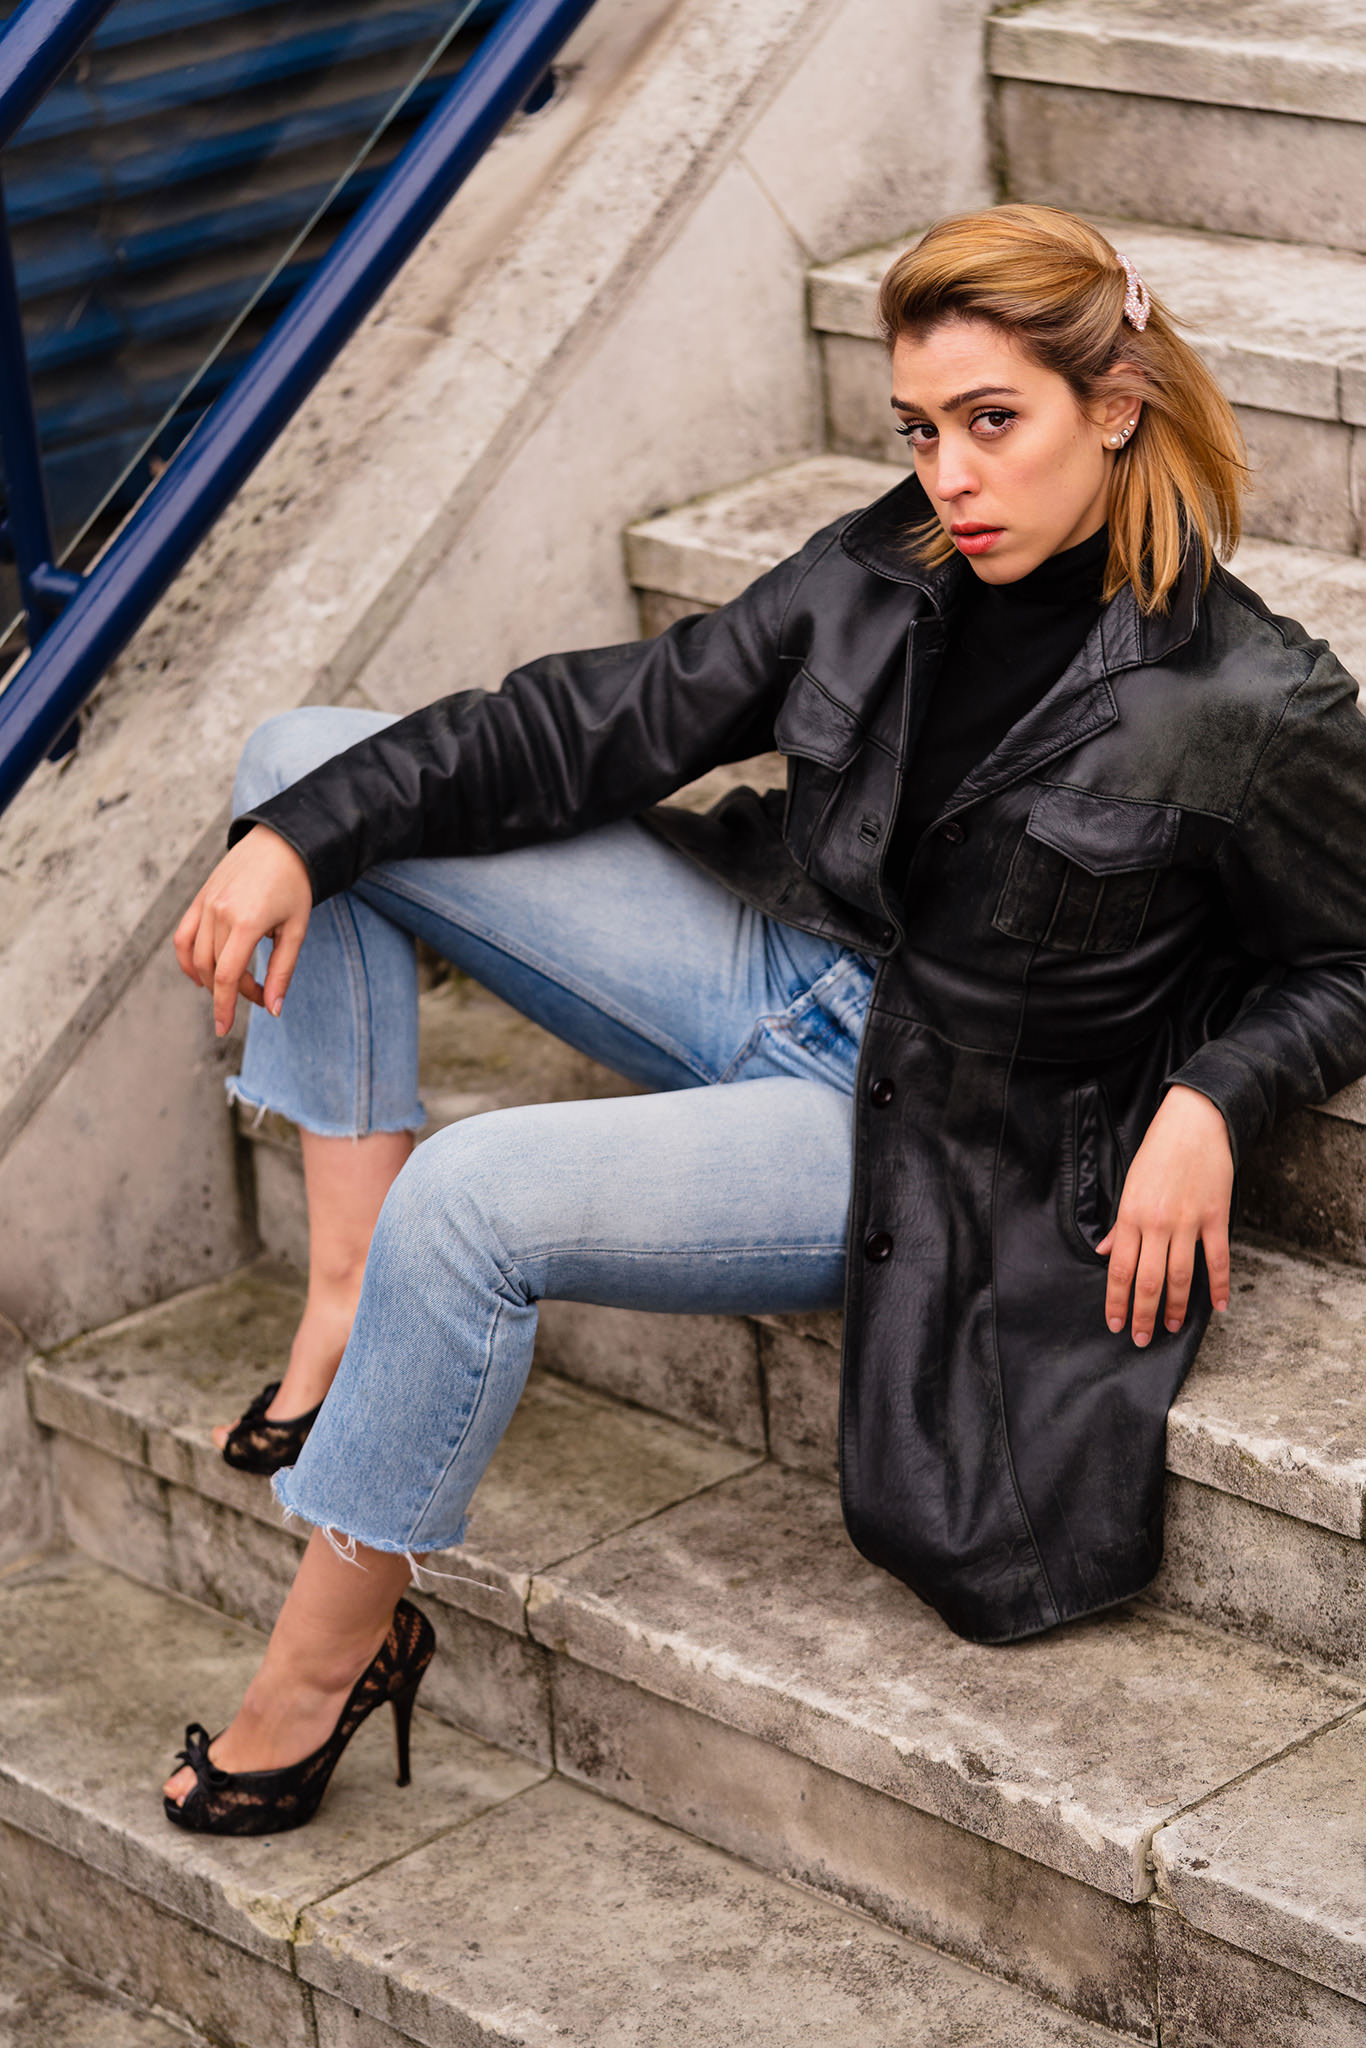 posed actress shoot